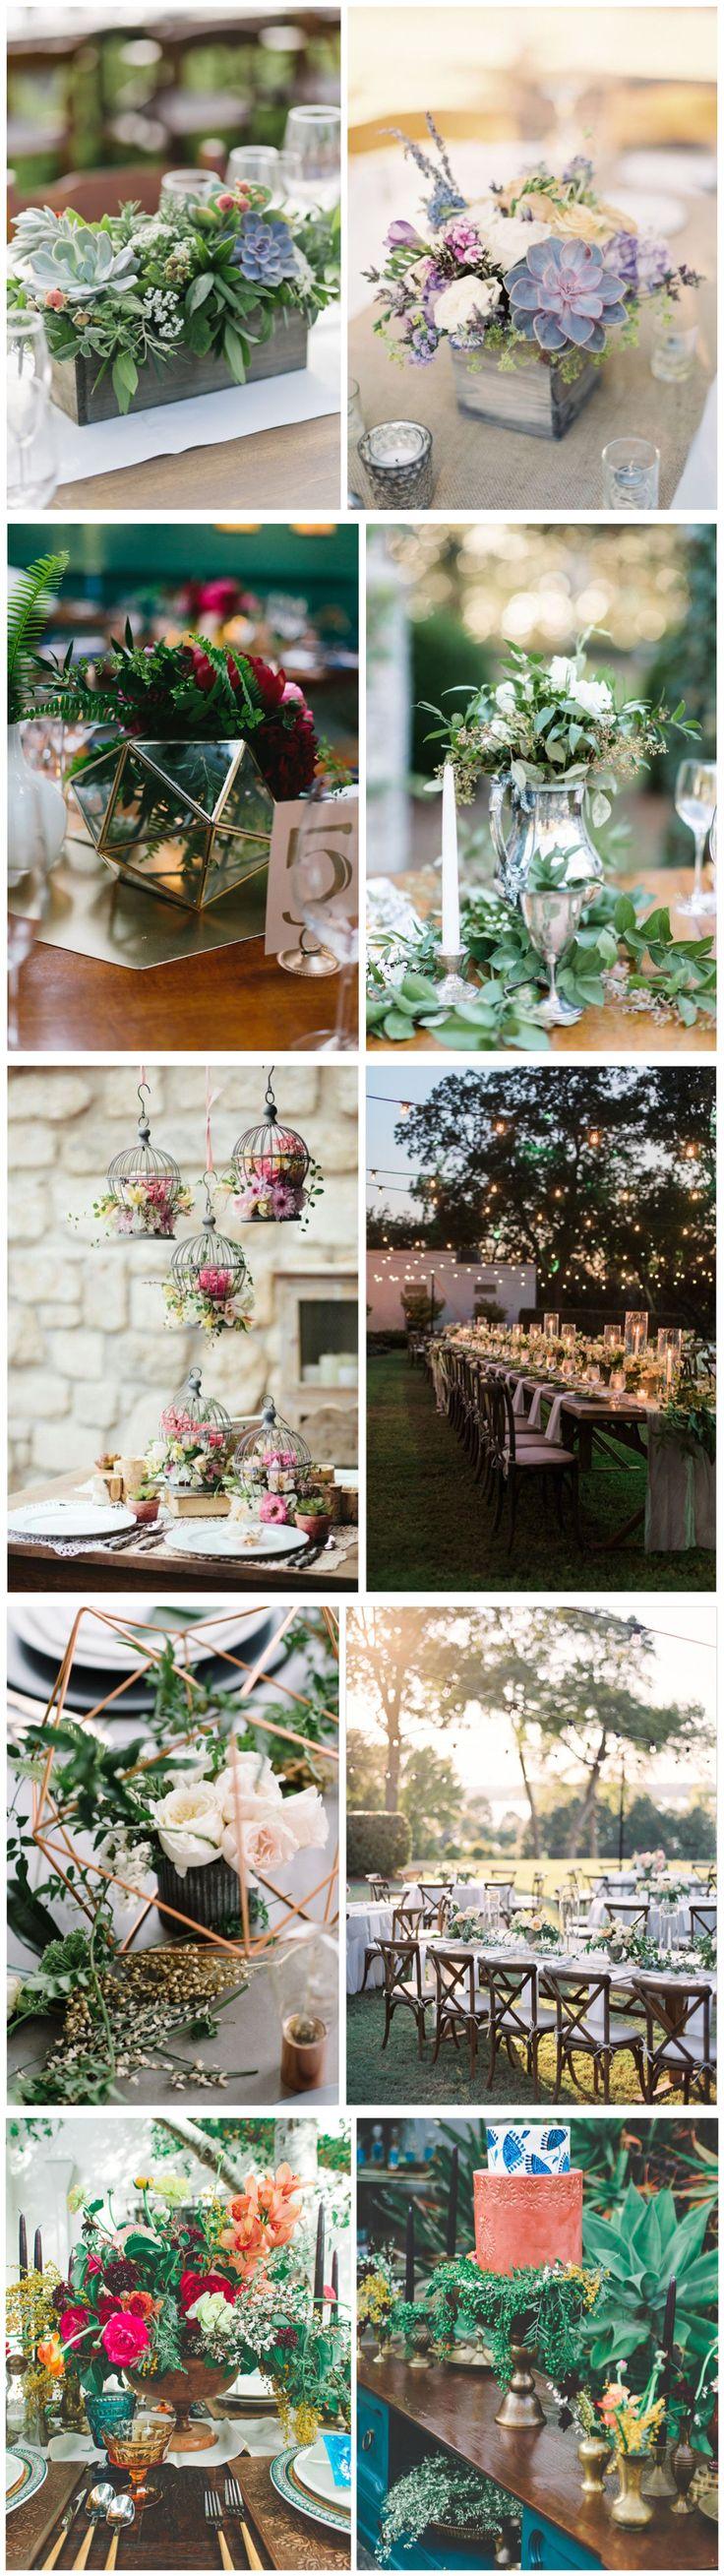 backyard wedding centerpiece ideas 15 pool decor ideas for your